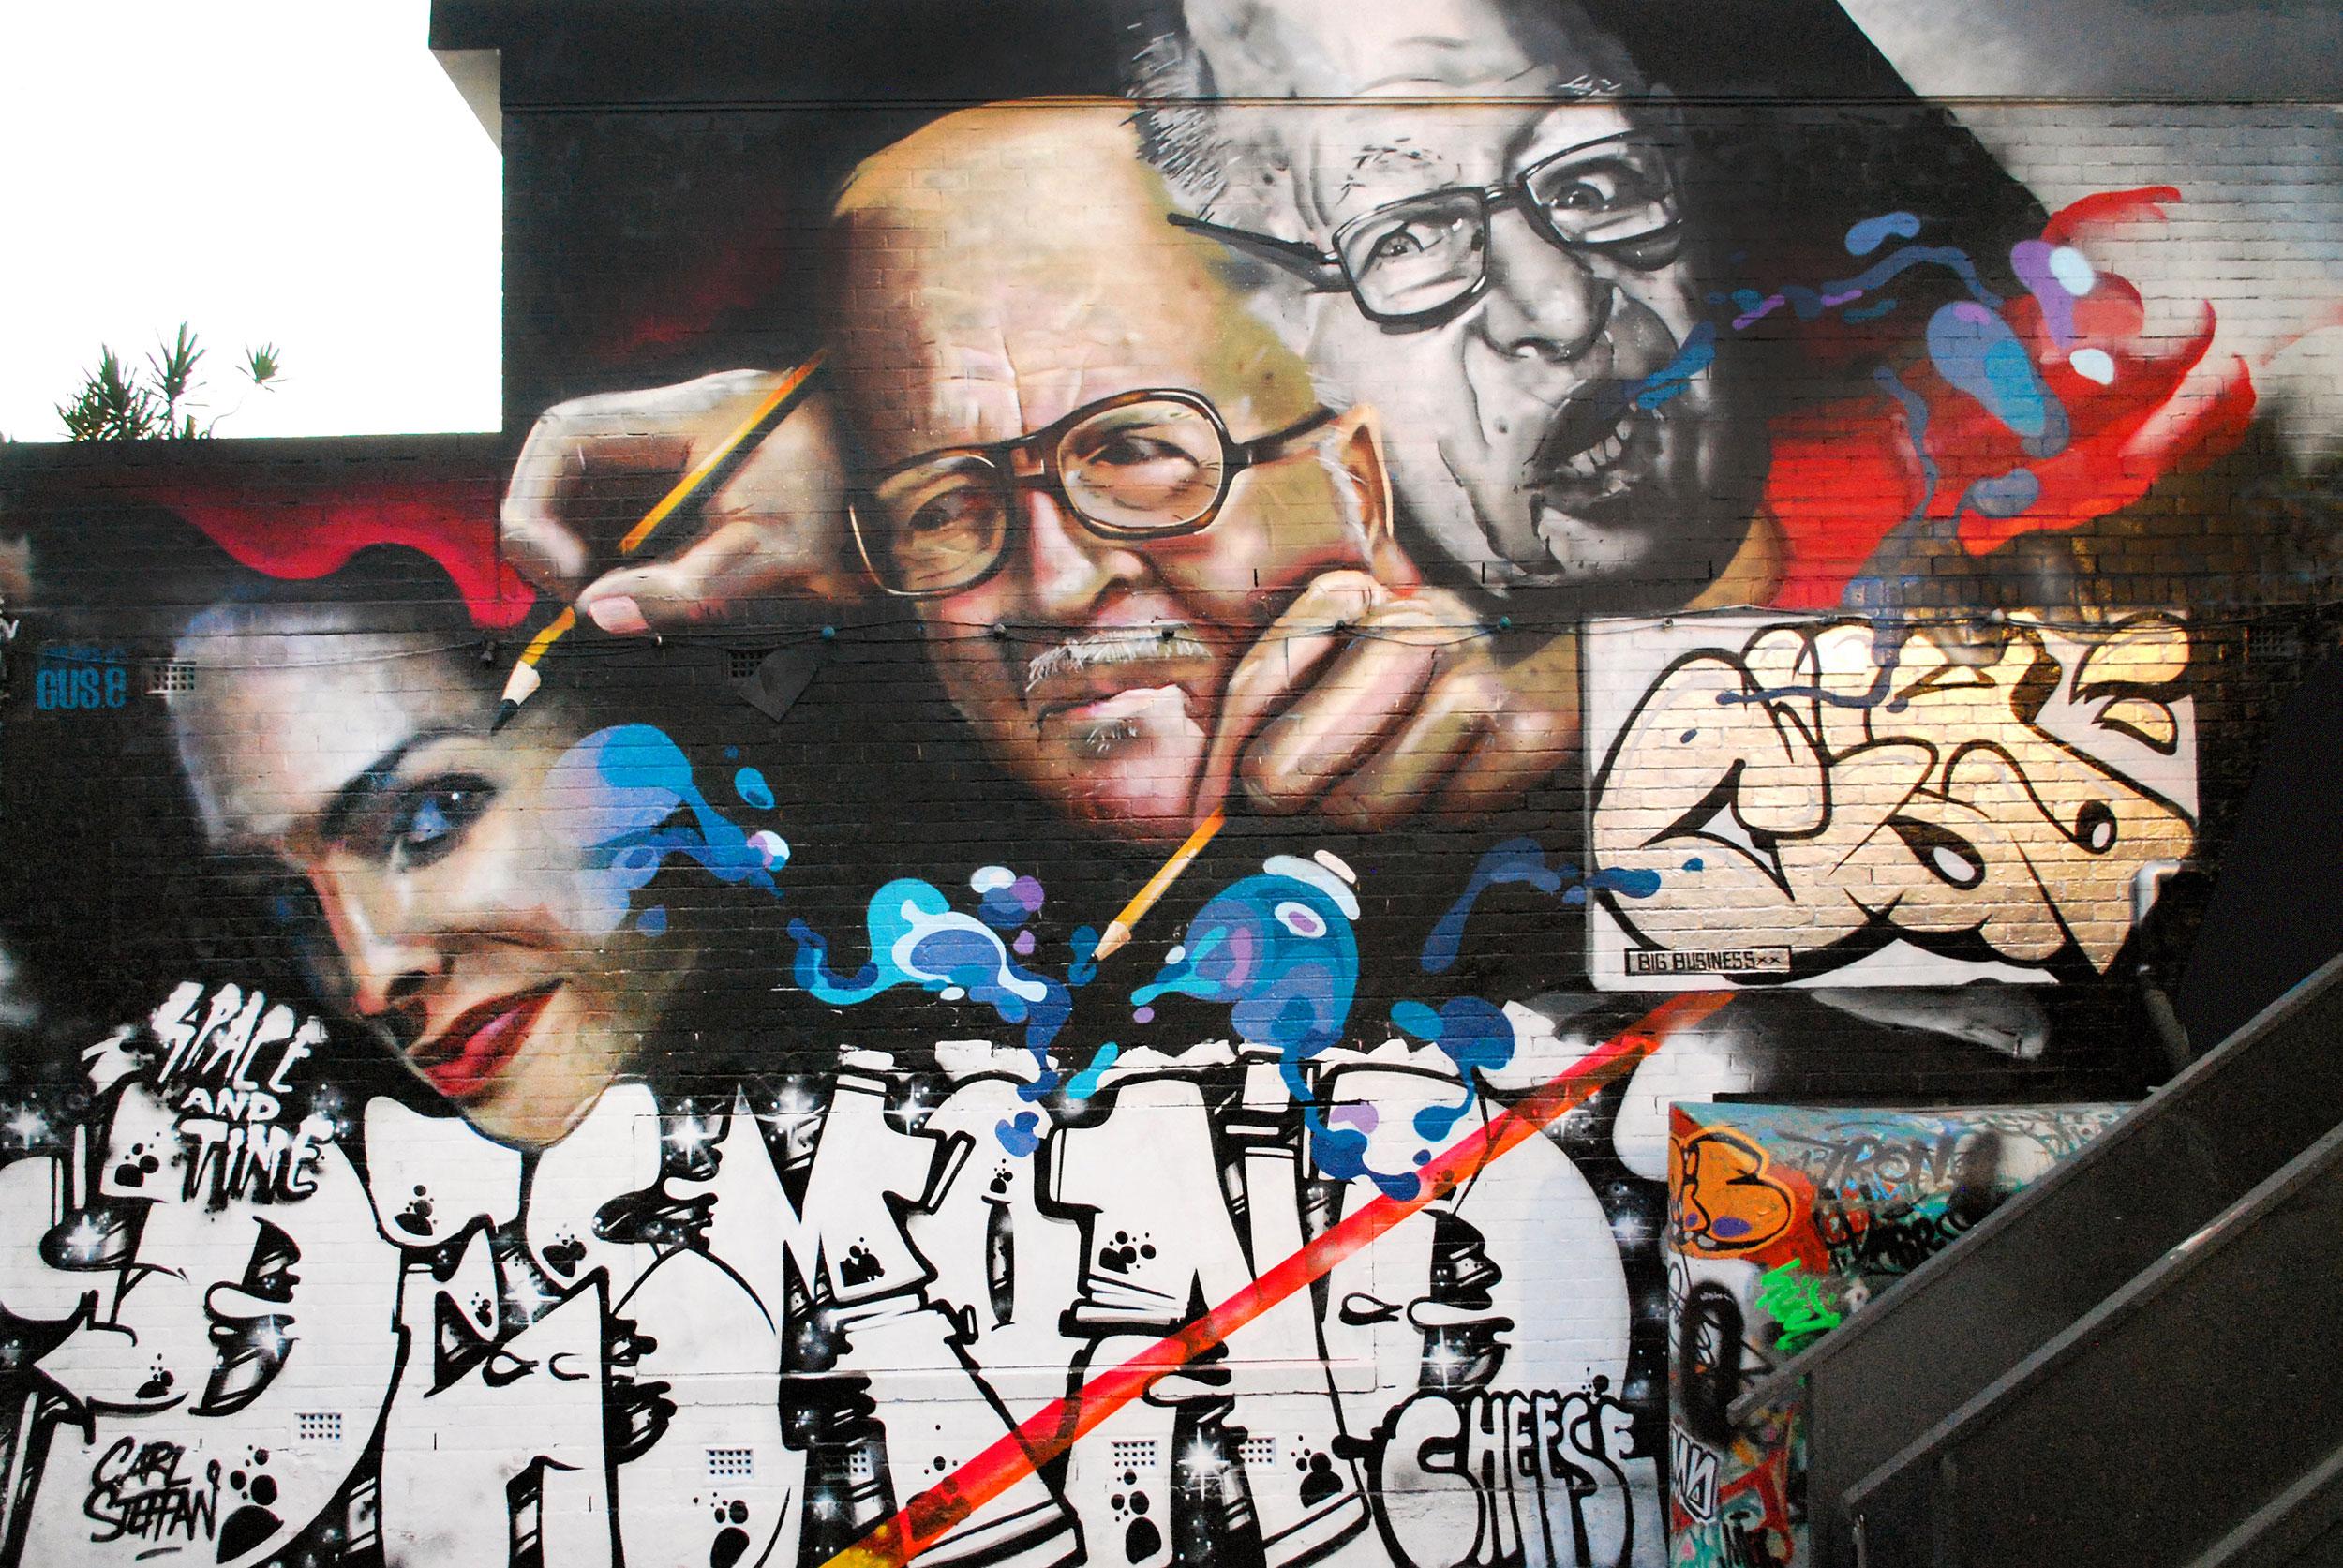 gus-eagleton-2013-the-inbetween-mural-wall-2-brisbane-colab-carl-stephen.jpg